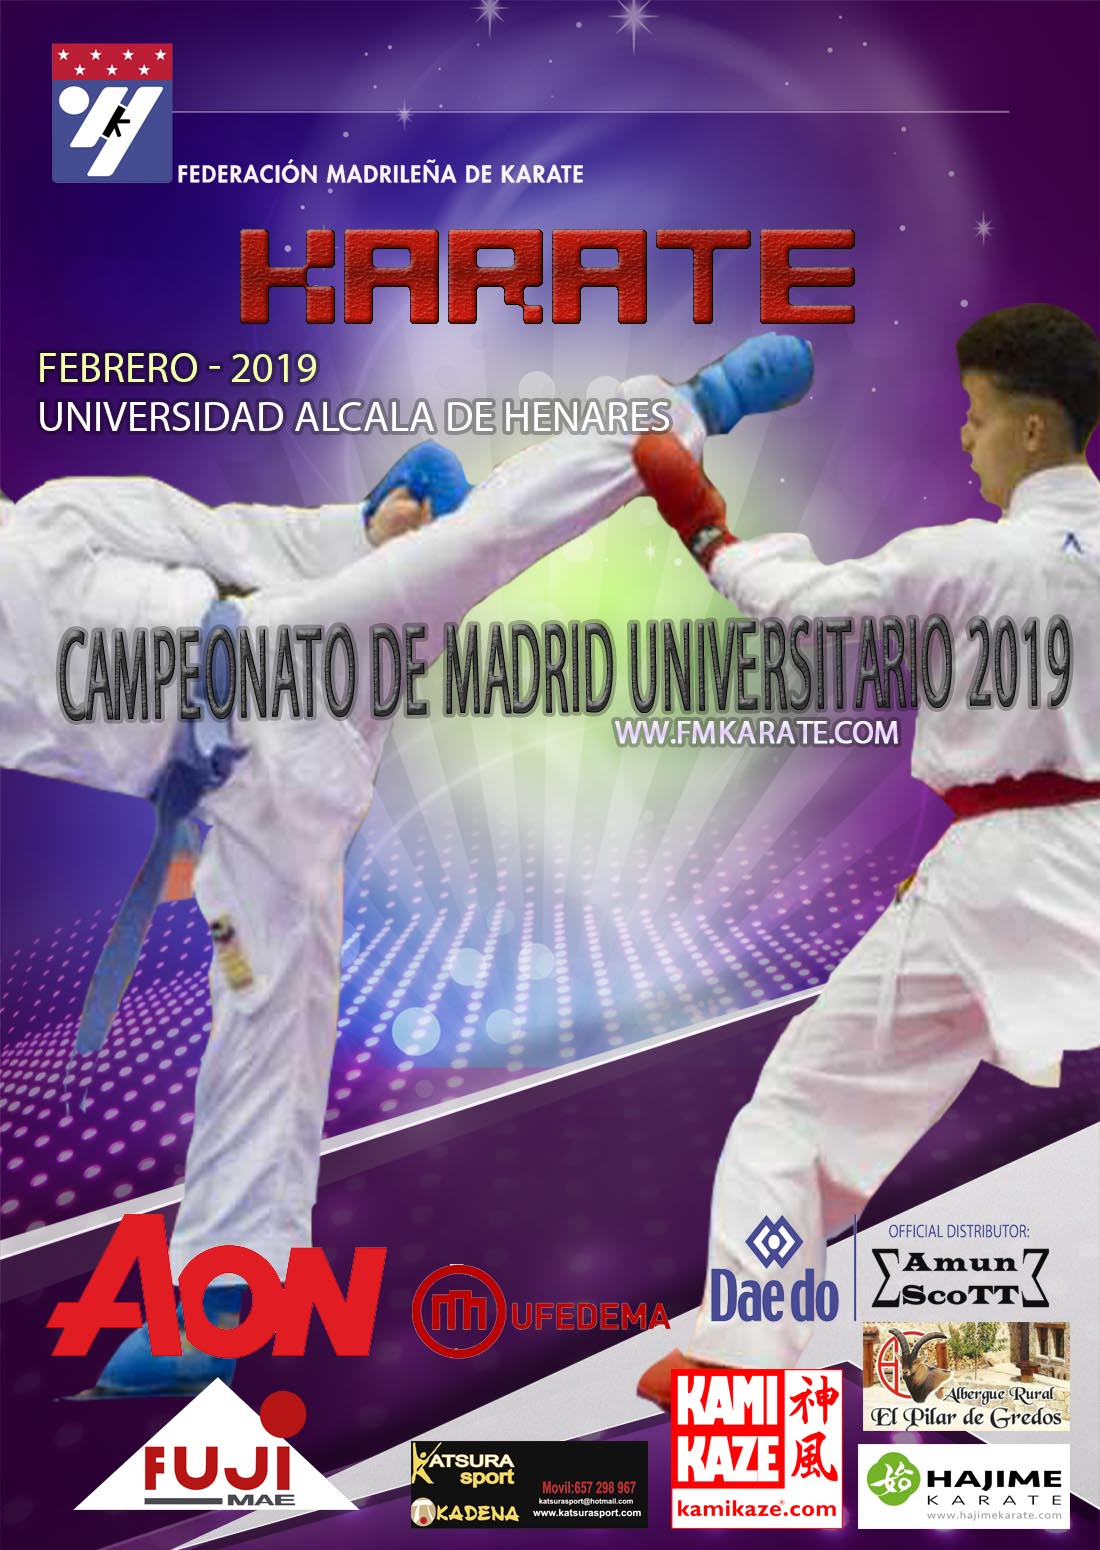 Campeonato Universitario de Madrid 2019